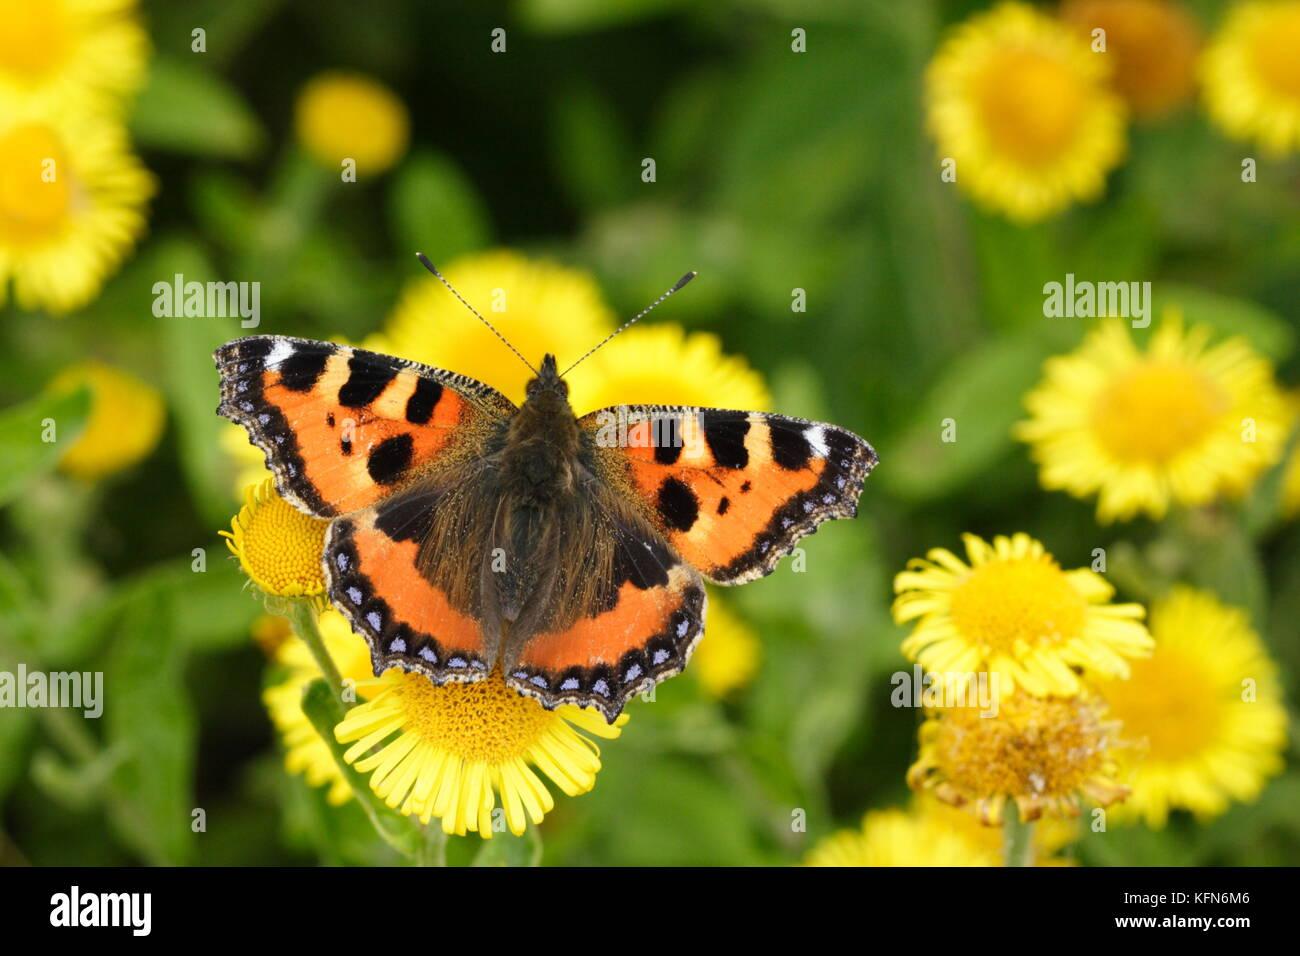 Small Tortoiseshell butterfly nectaring on Fleabane - Stock Image